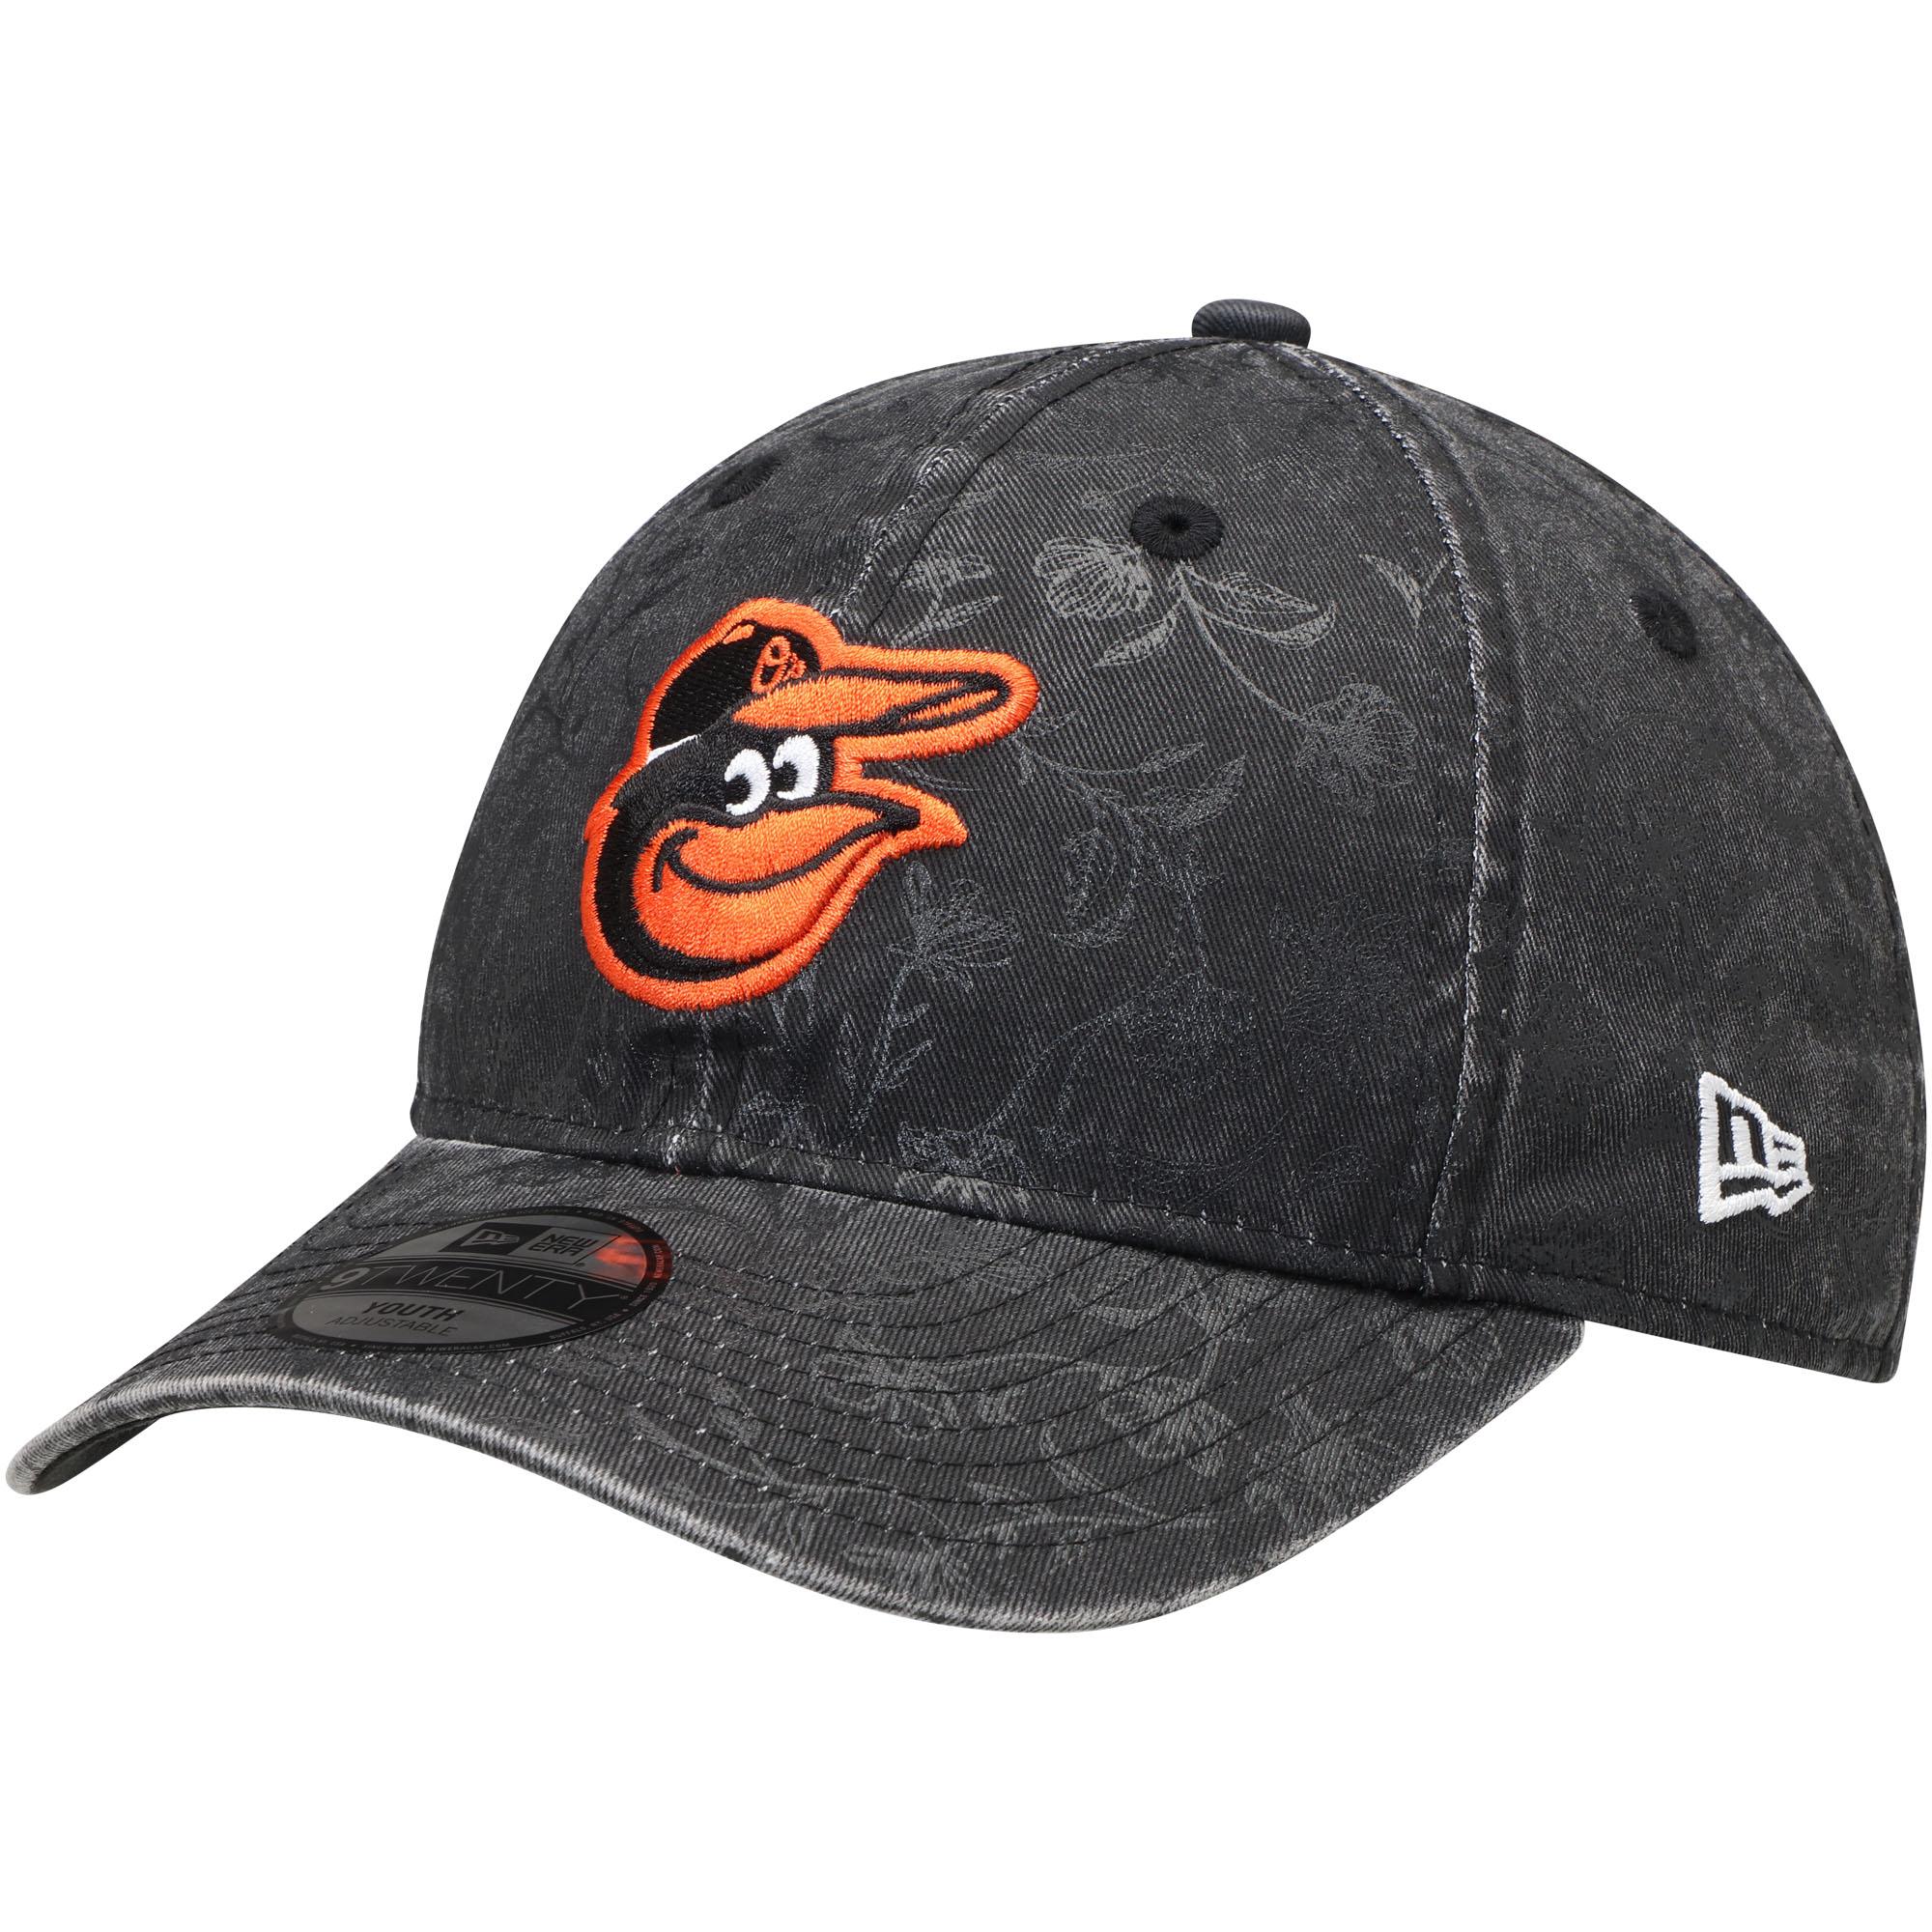 Baltimore Orioles New Era Girls Youth Floral Peek 9TWENTY Adjustable Hat - Black - OSFA